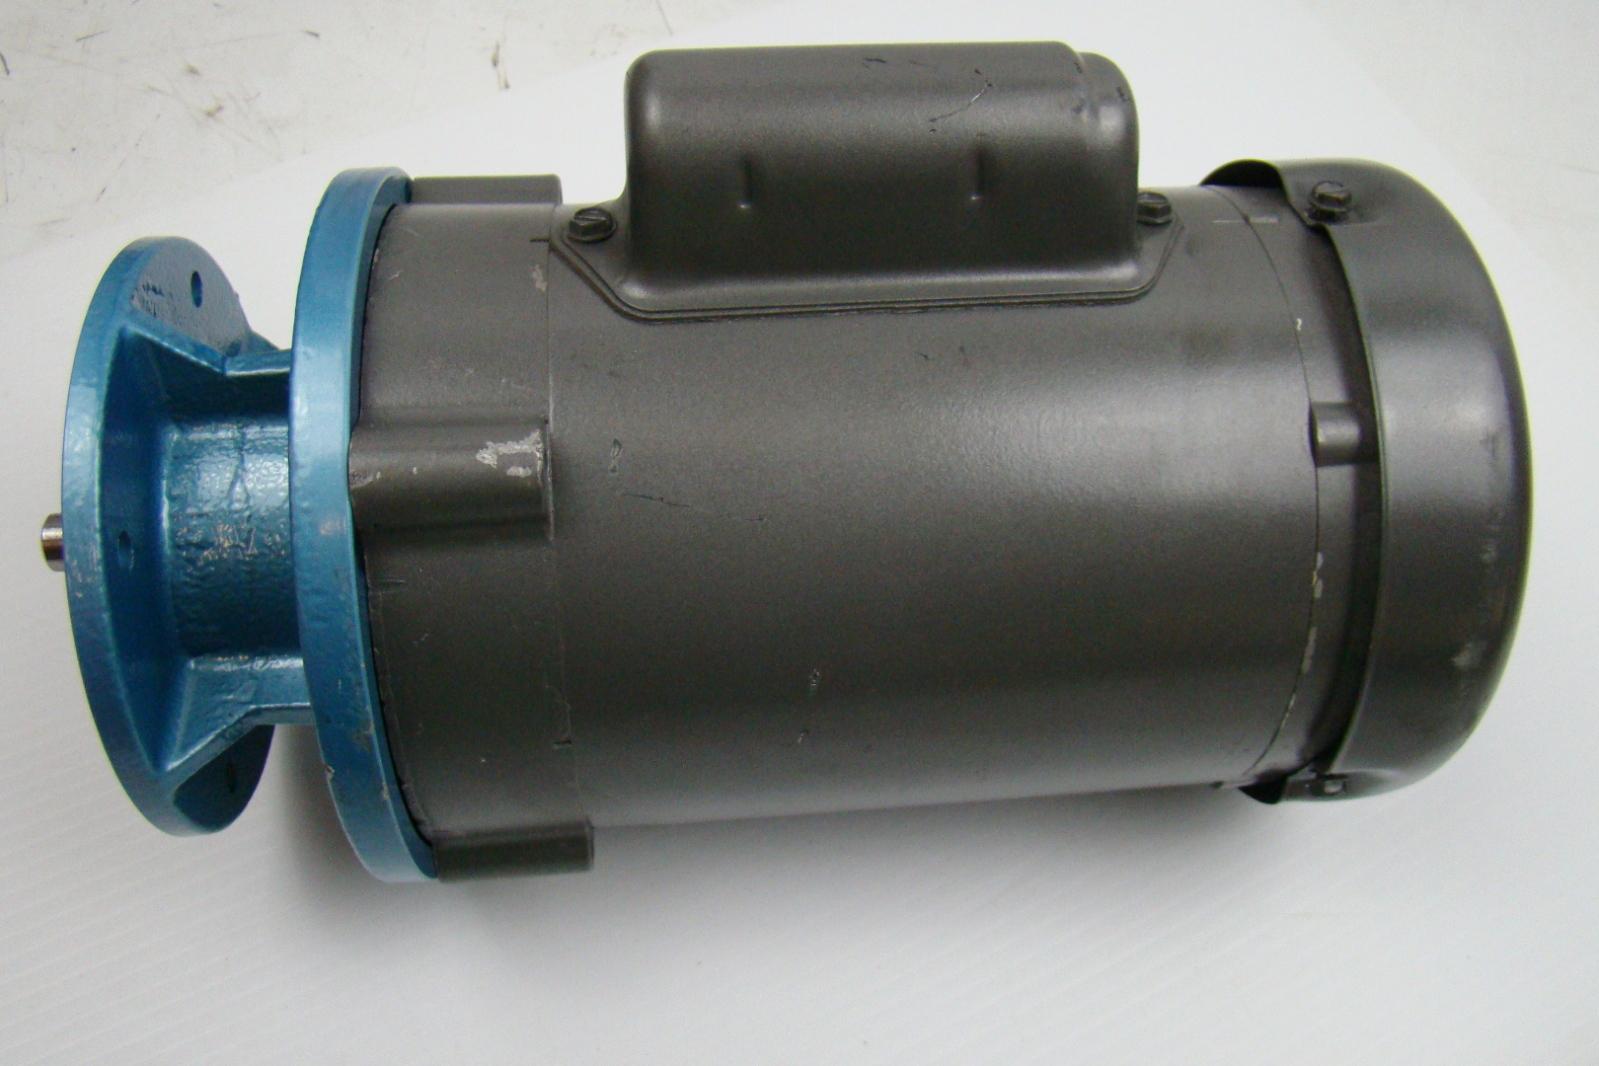 Baldor 1 4 hp industrial motor 115 230v single phase 56c for Baldor 2 hp single phase motor